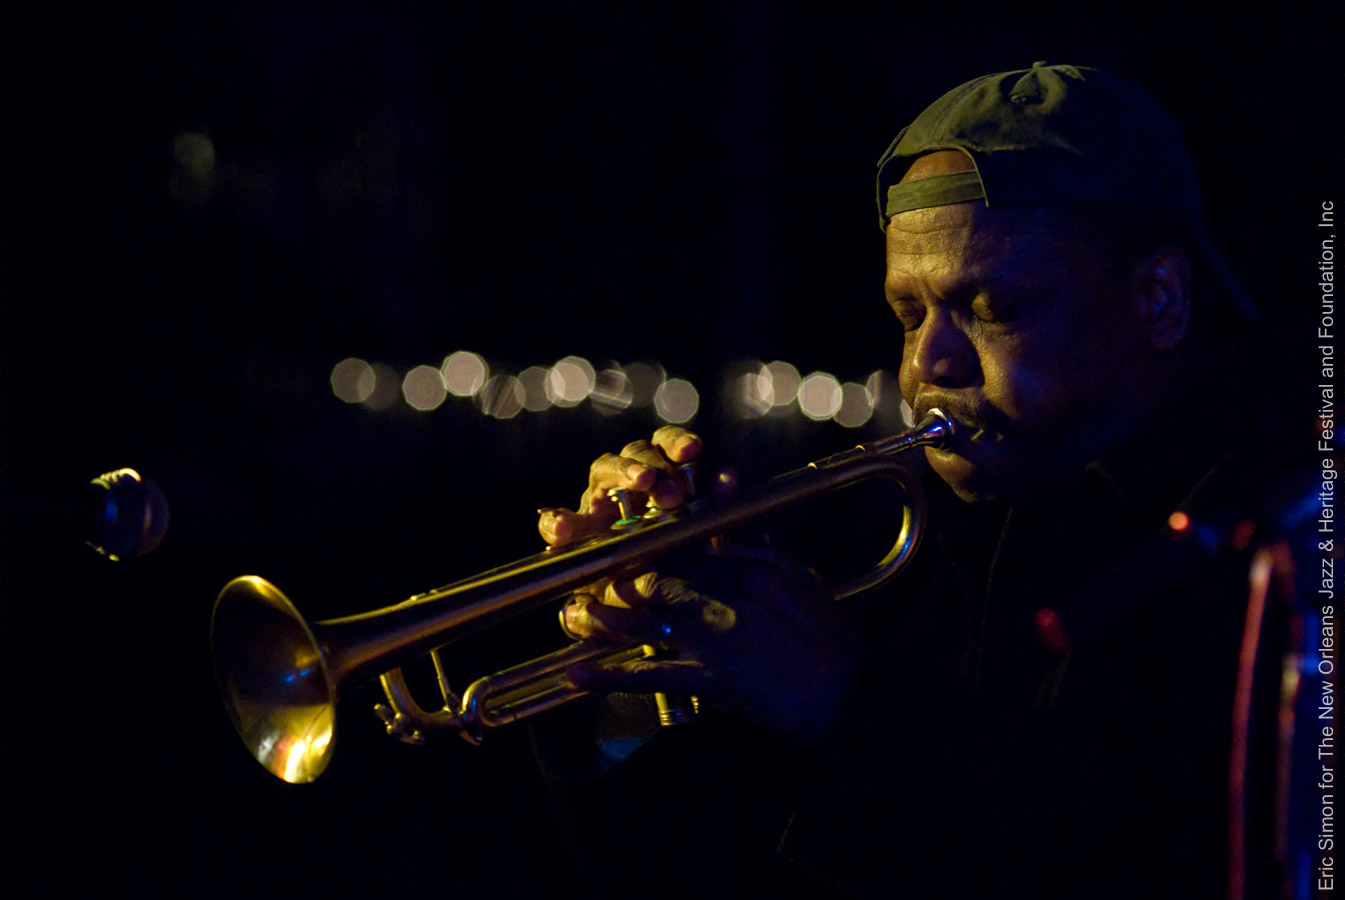 2008 Treme Creole Gumbo Festival, Leroy Jones, Music, New Orleans